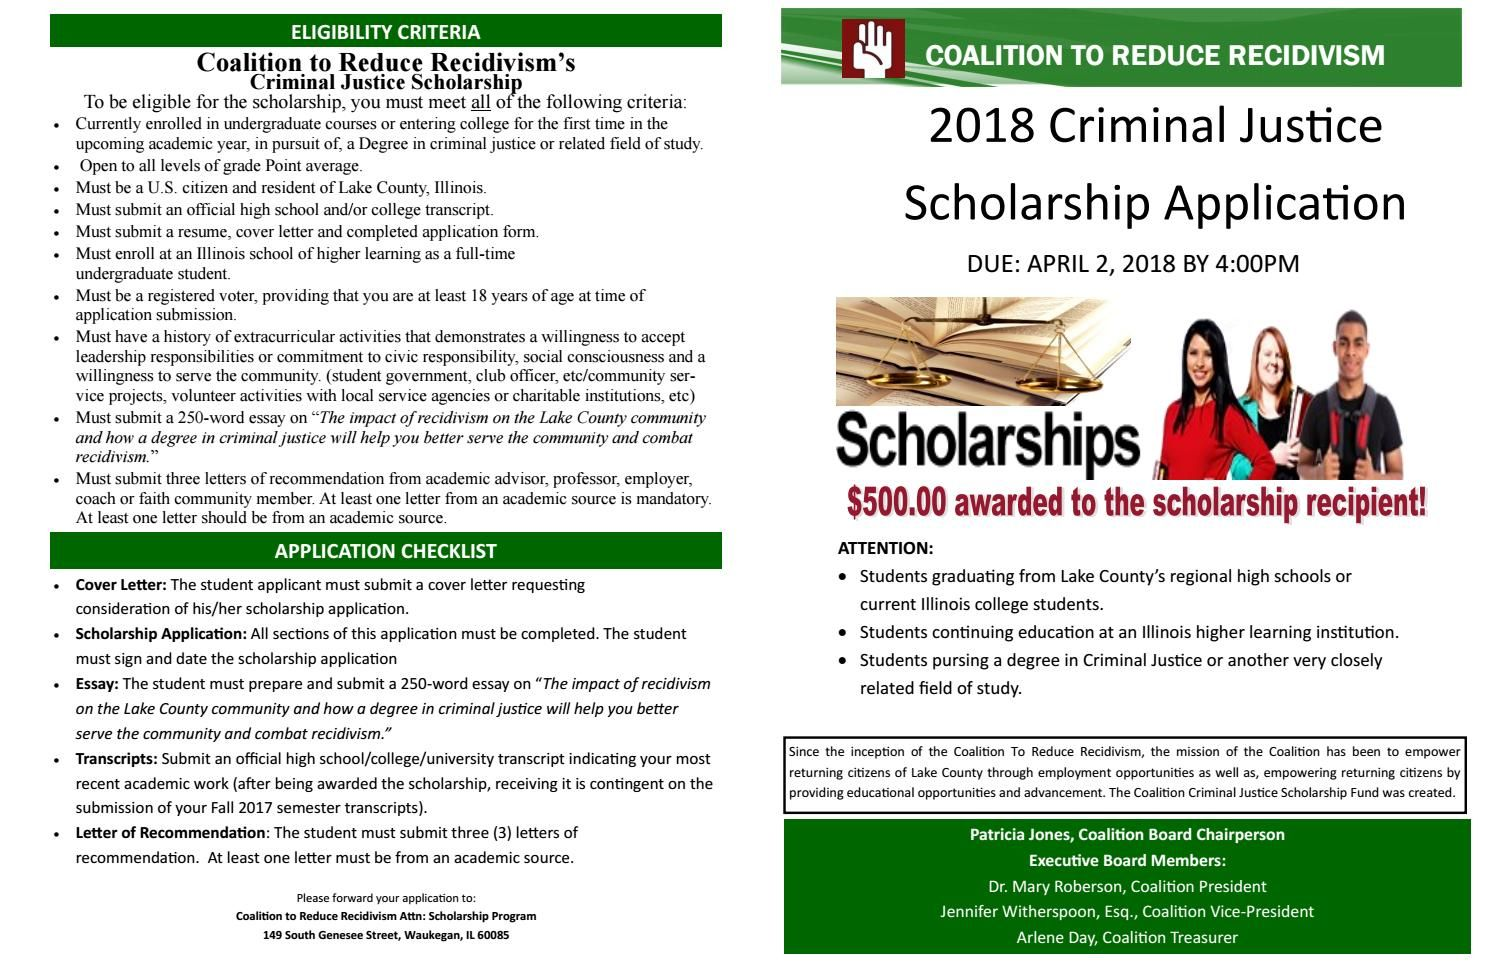 2018 Coalition Criminal Justice Scholarship Application